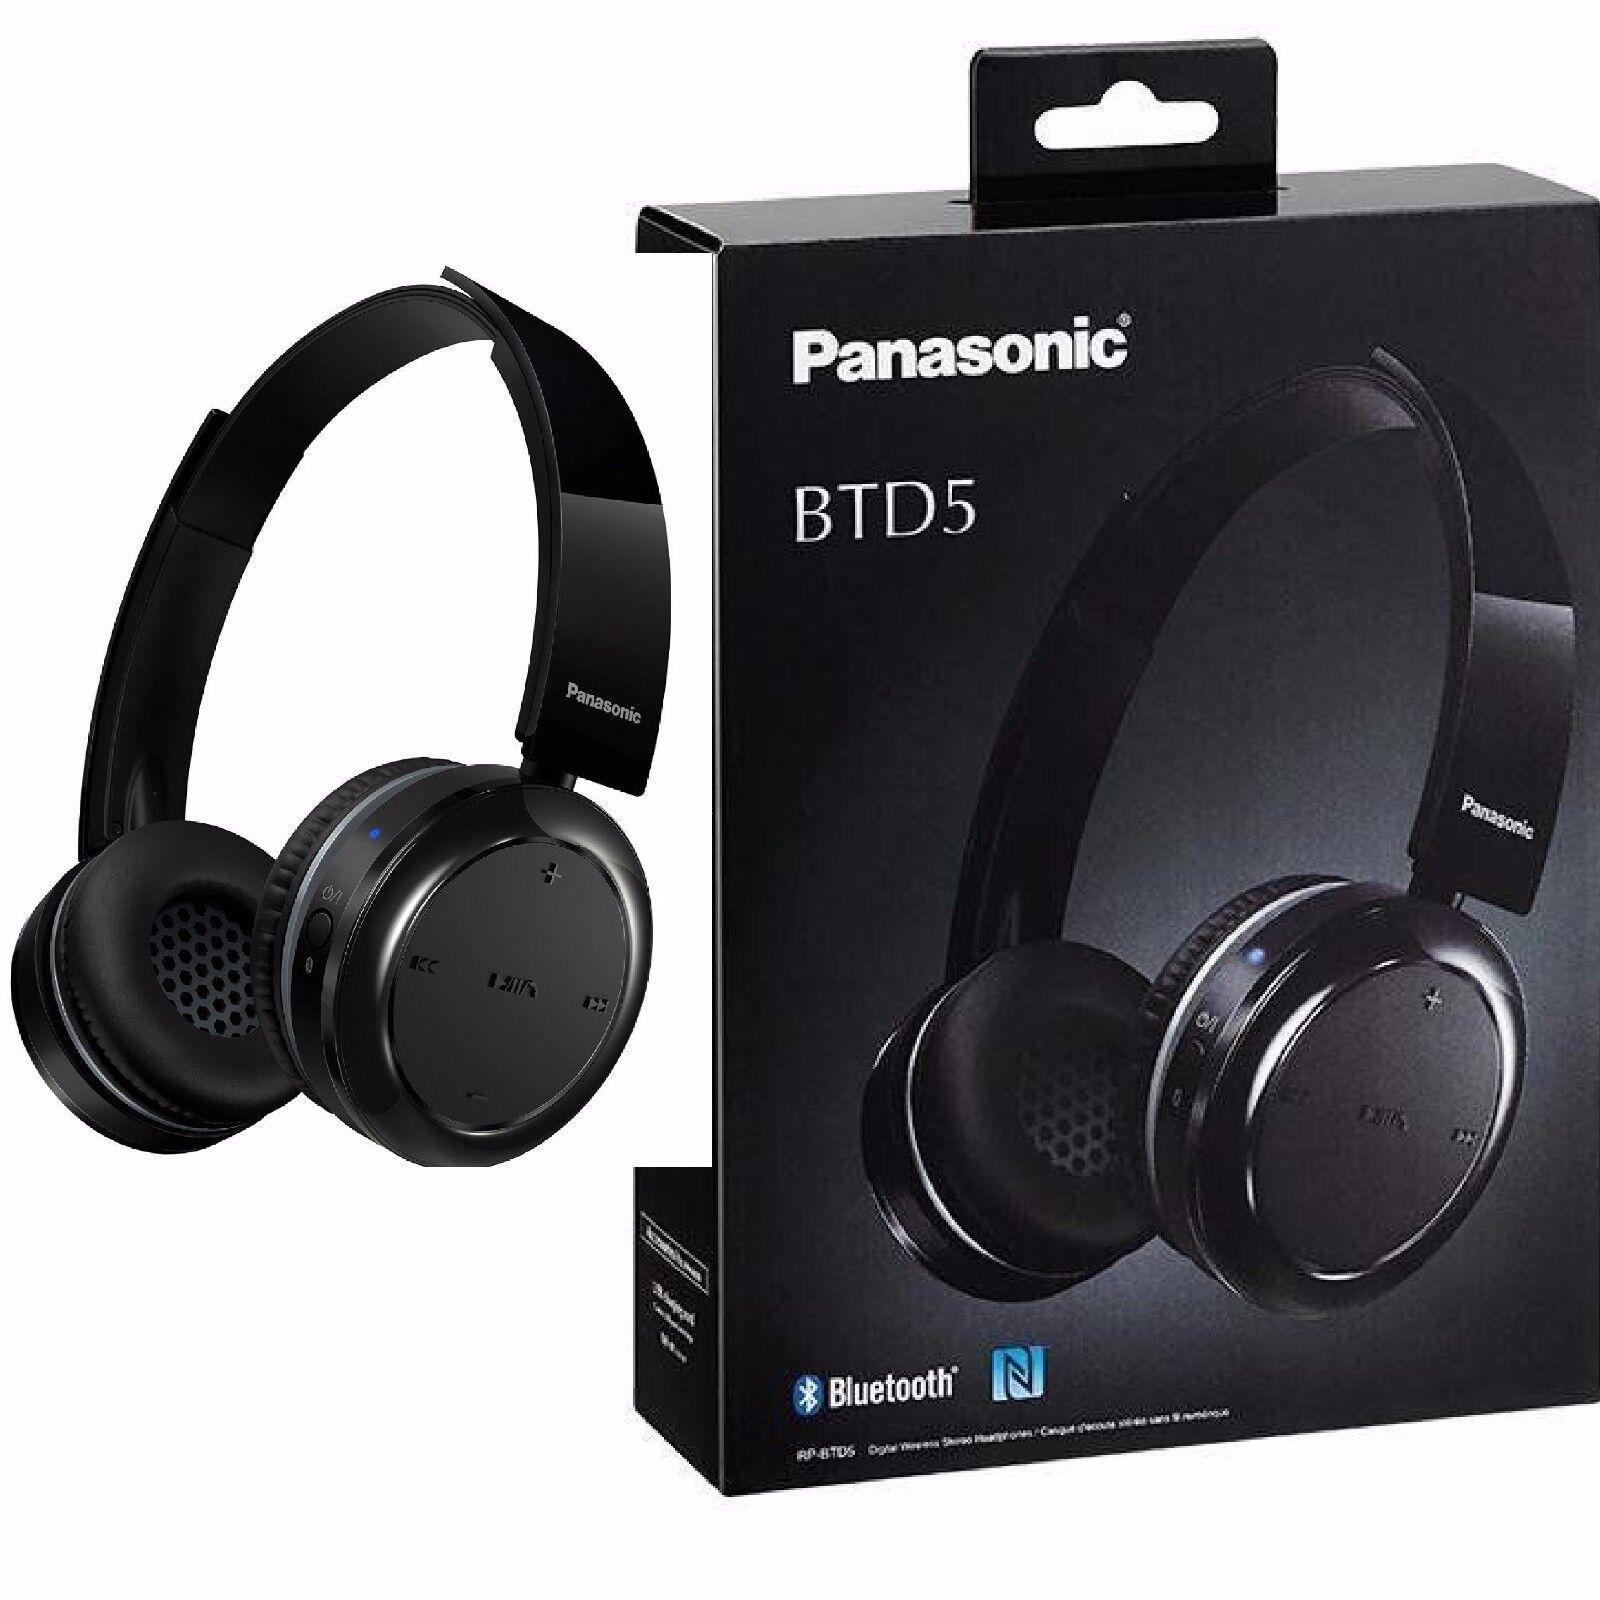 Panasonic RP-BTD5E-K bleutooth casque-Réponse en fréquence Boutons 18-20,0